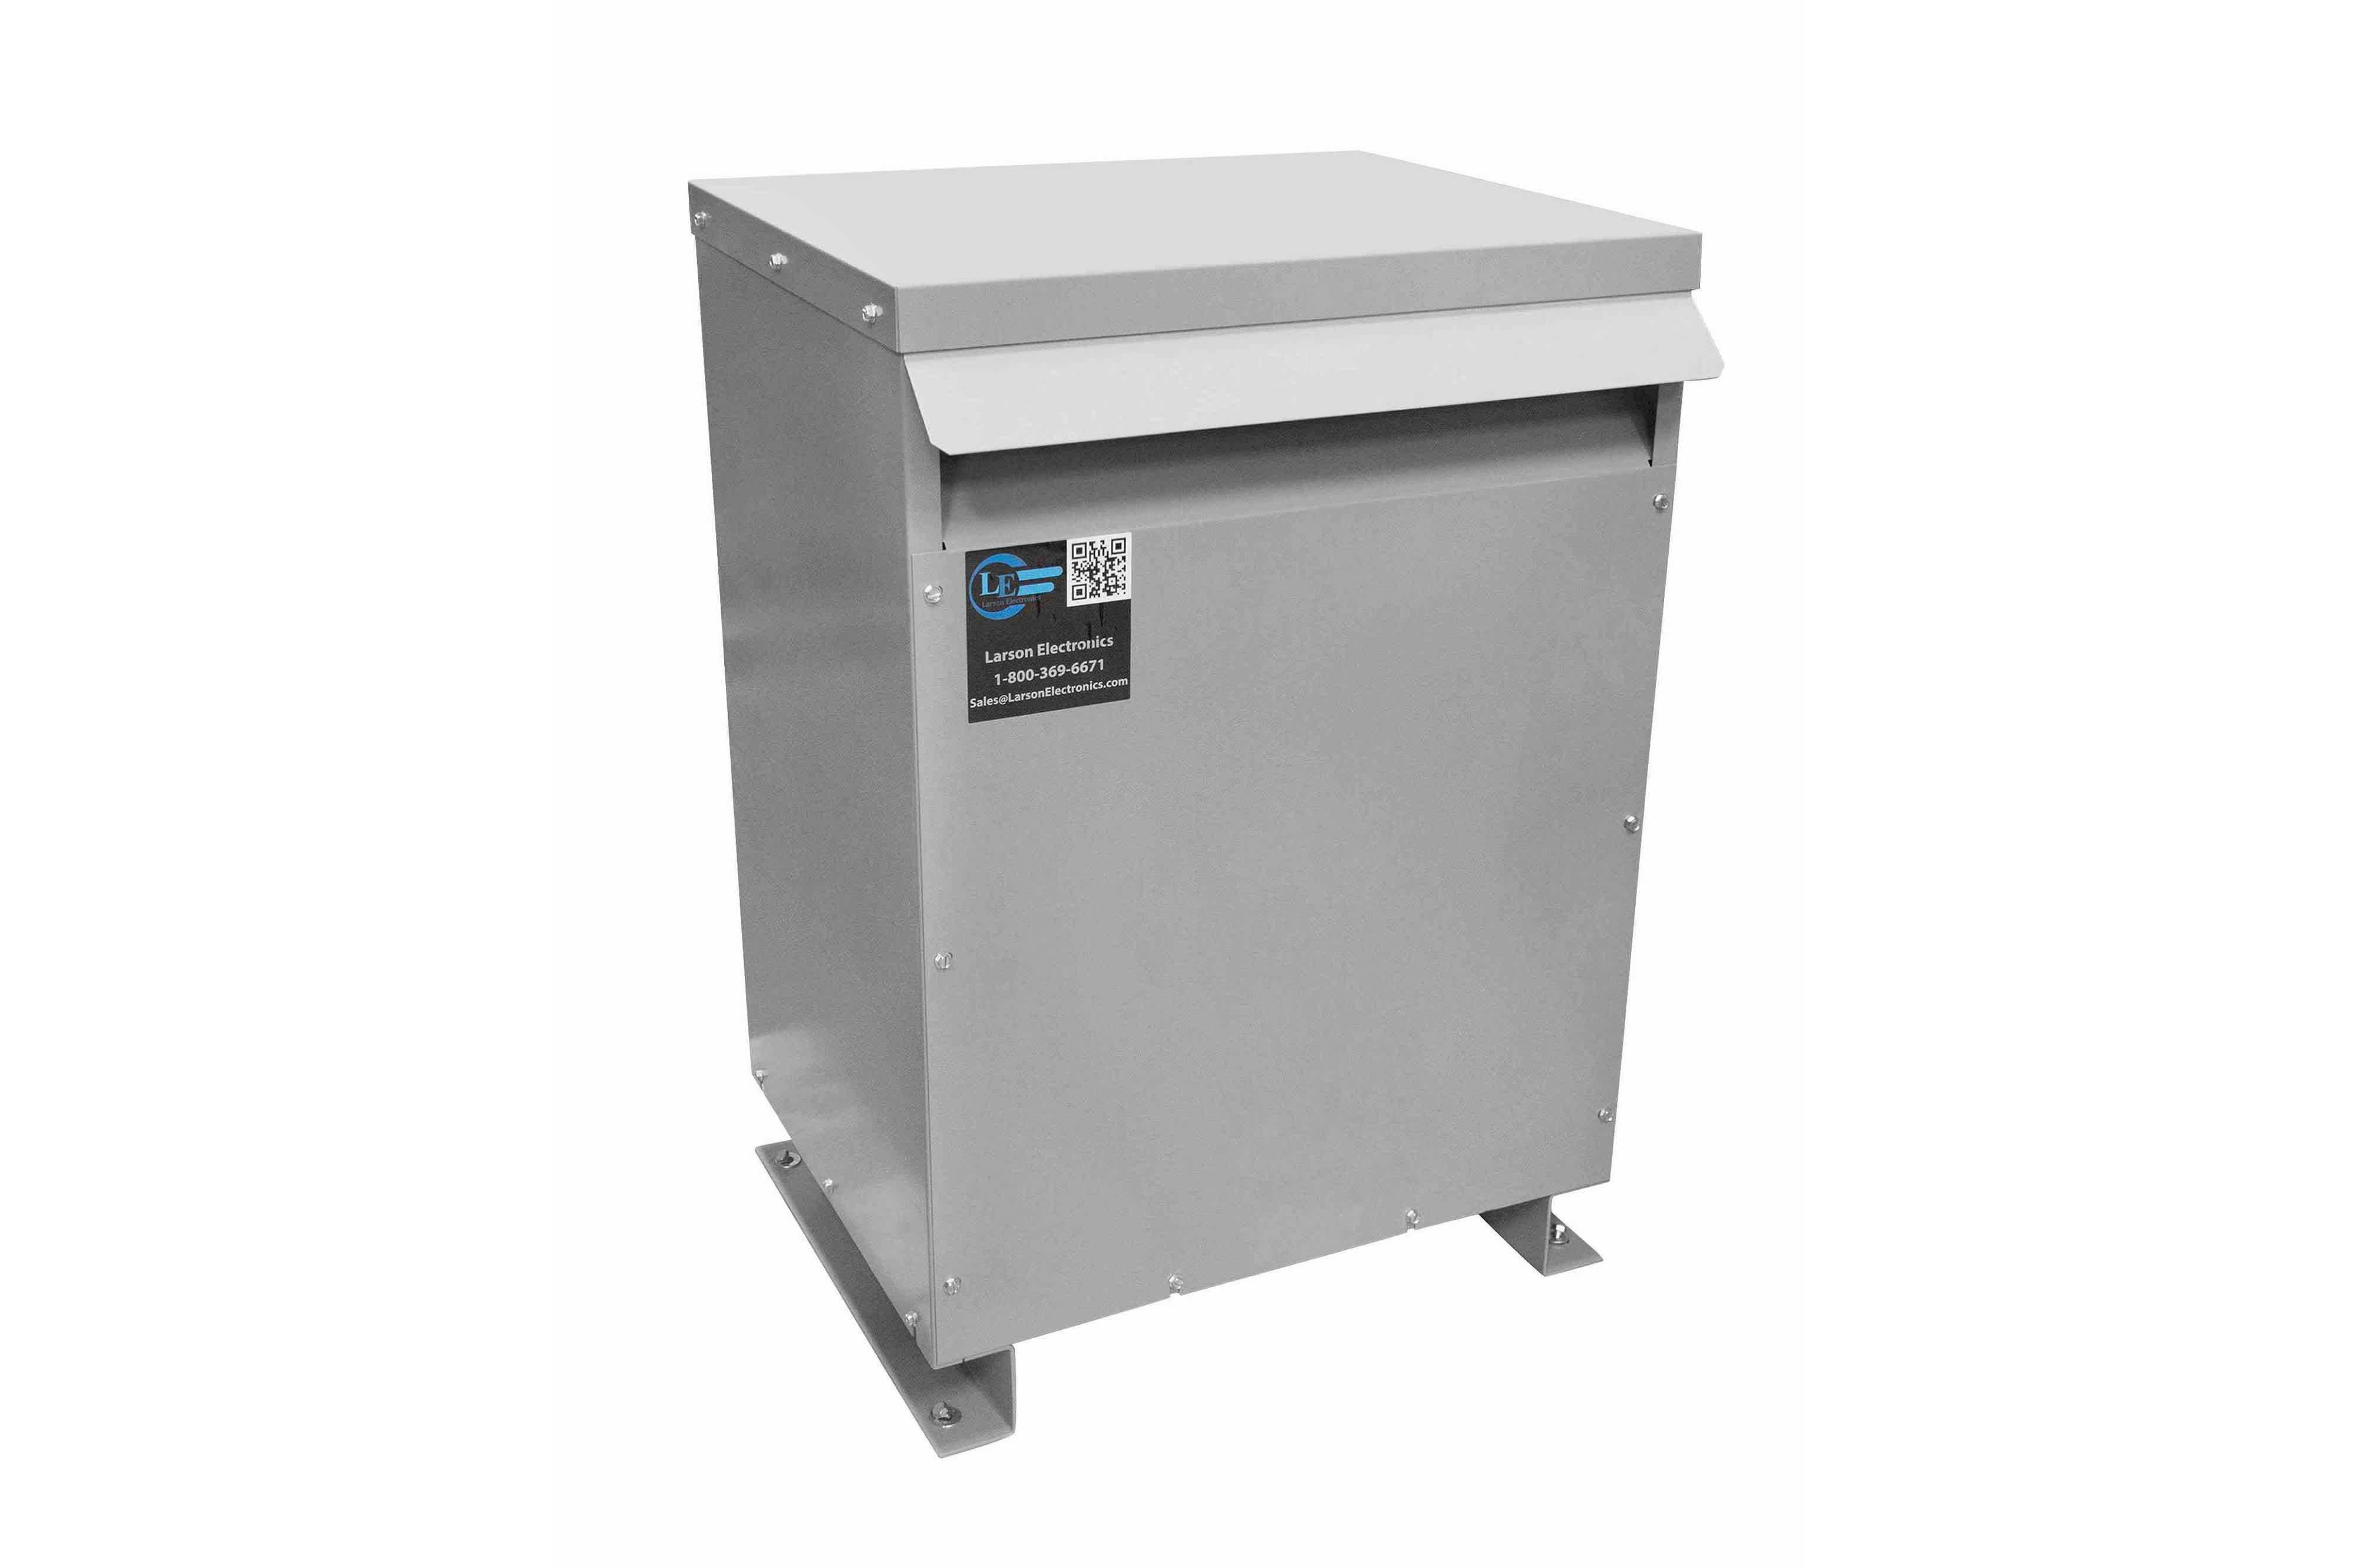 12 kVA 3PH Isolation Transformer, 460V Wye Primary, 415V Delta Secondary, N3R, Ventilated, 60 Hz